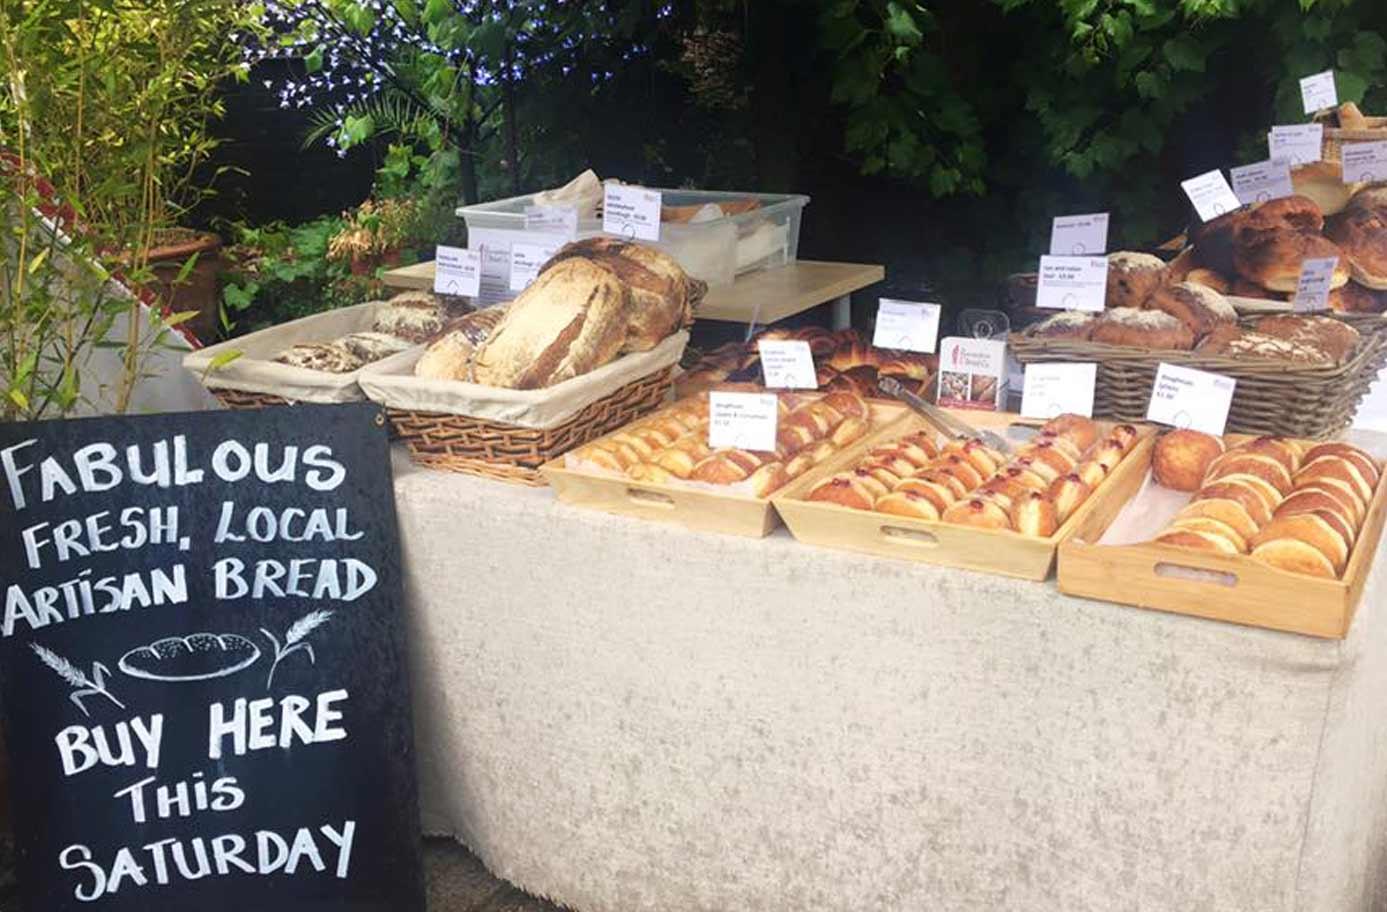 The Hampshire Real Bread Co at Draper's Yard